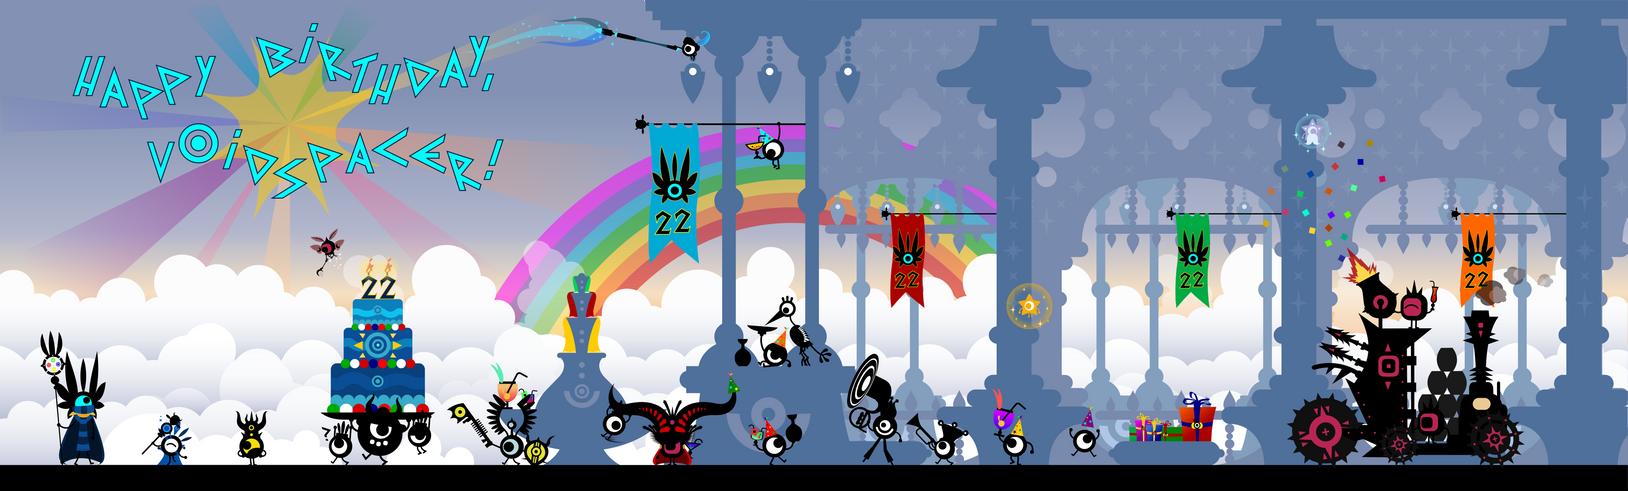 Happy Birthday V0idSpacer! by Fabierex2000